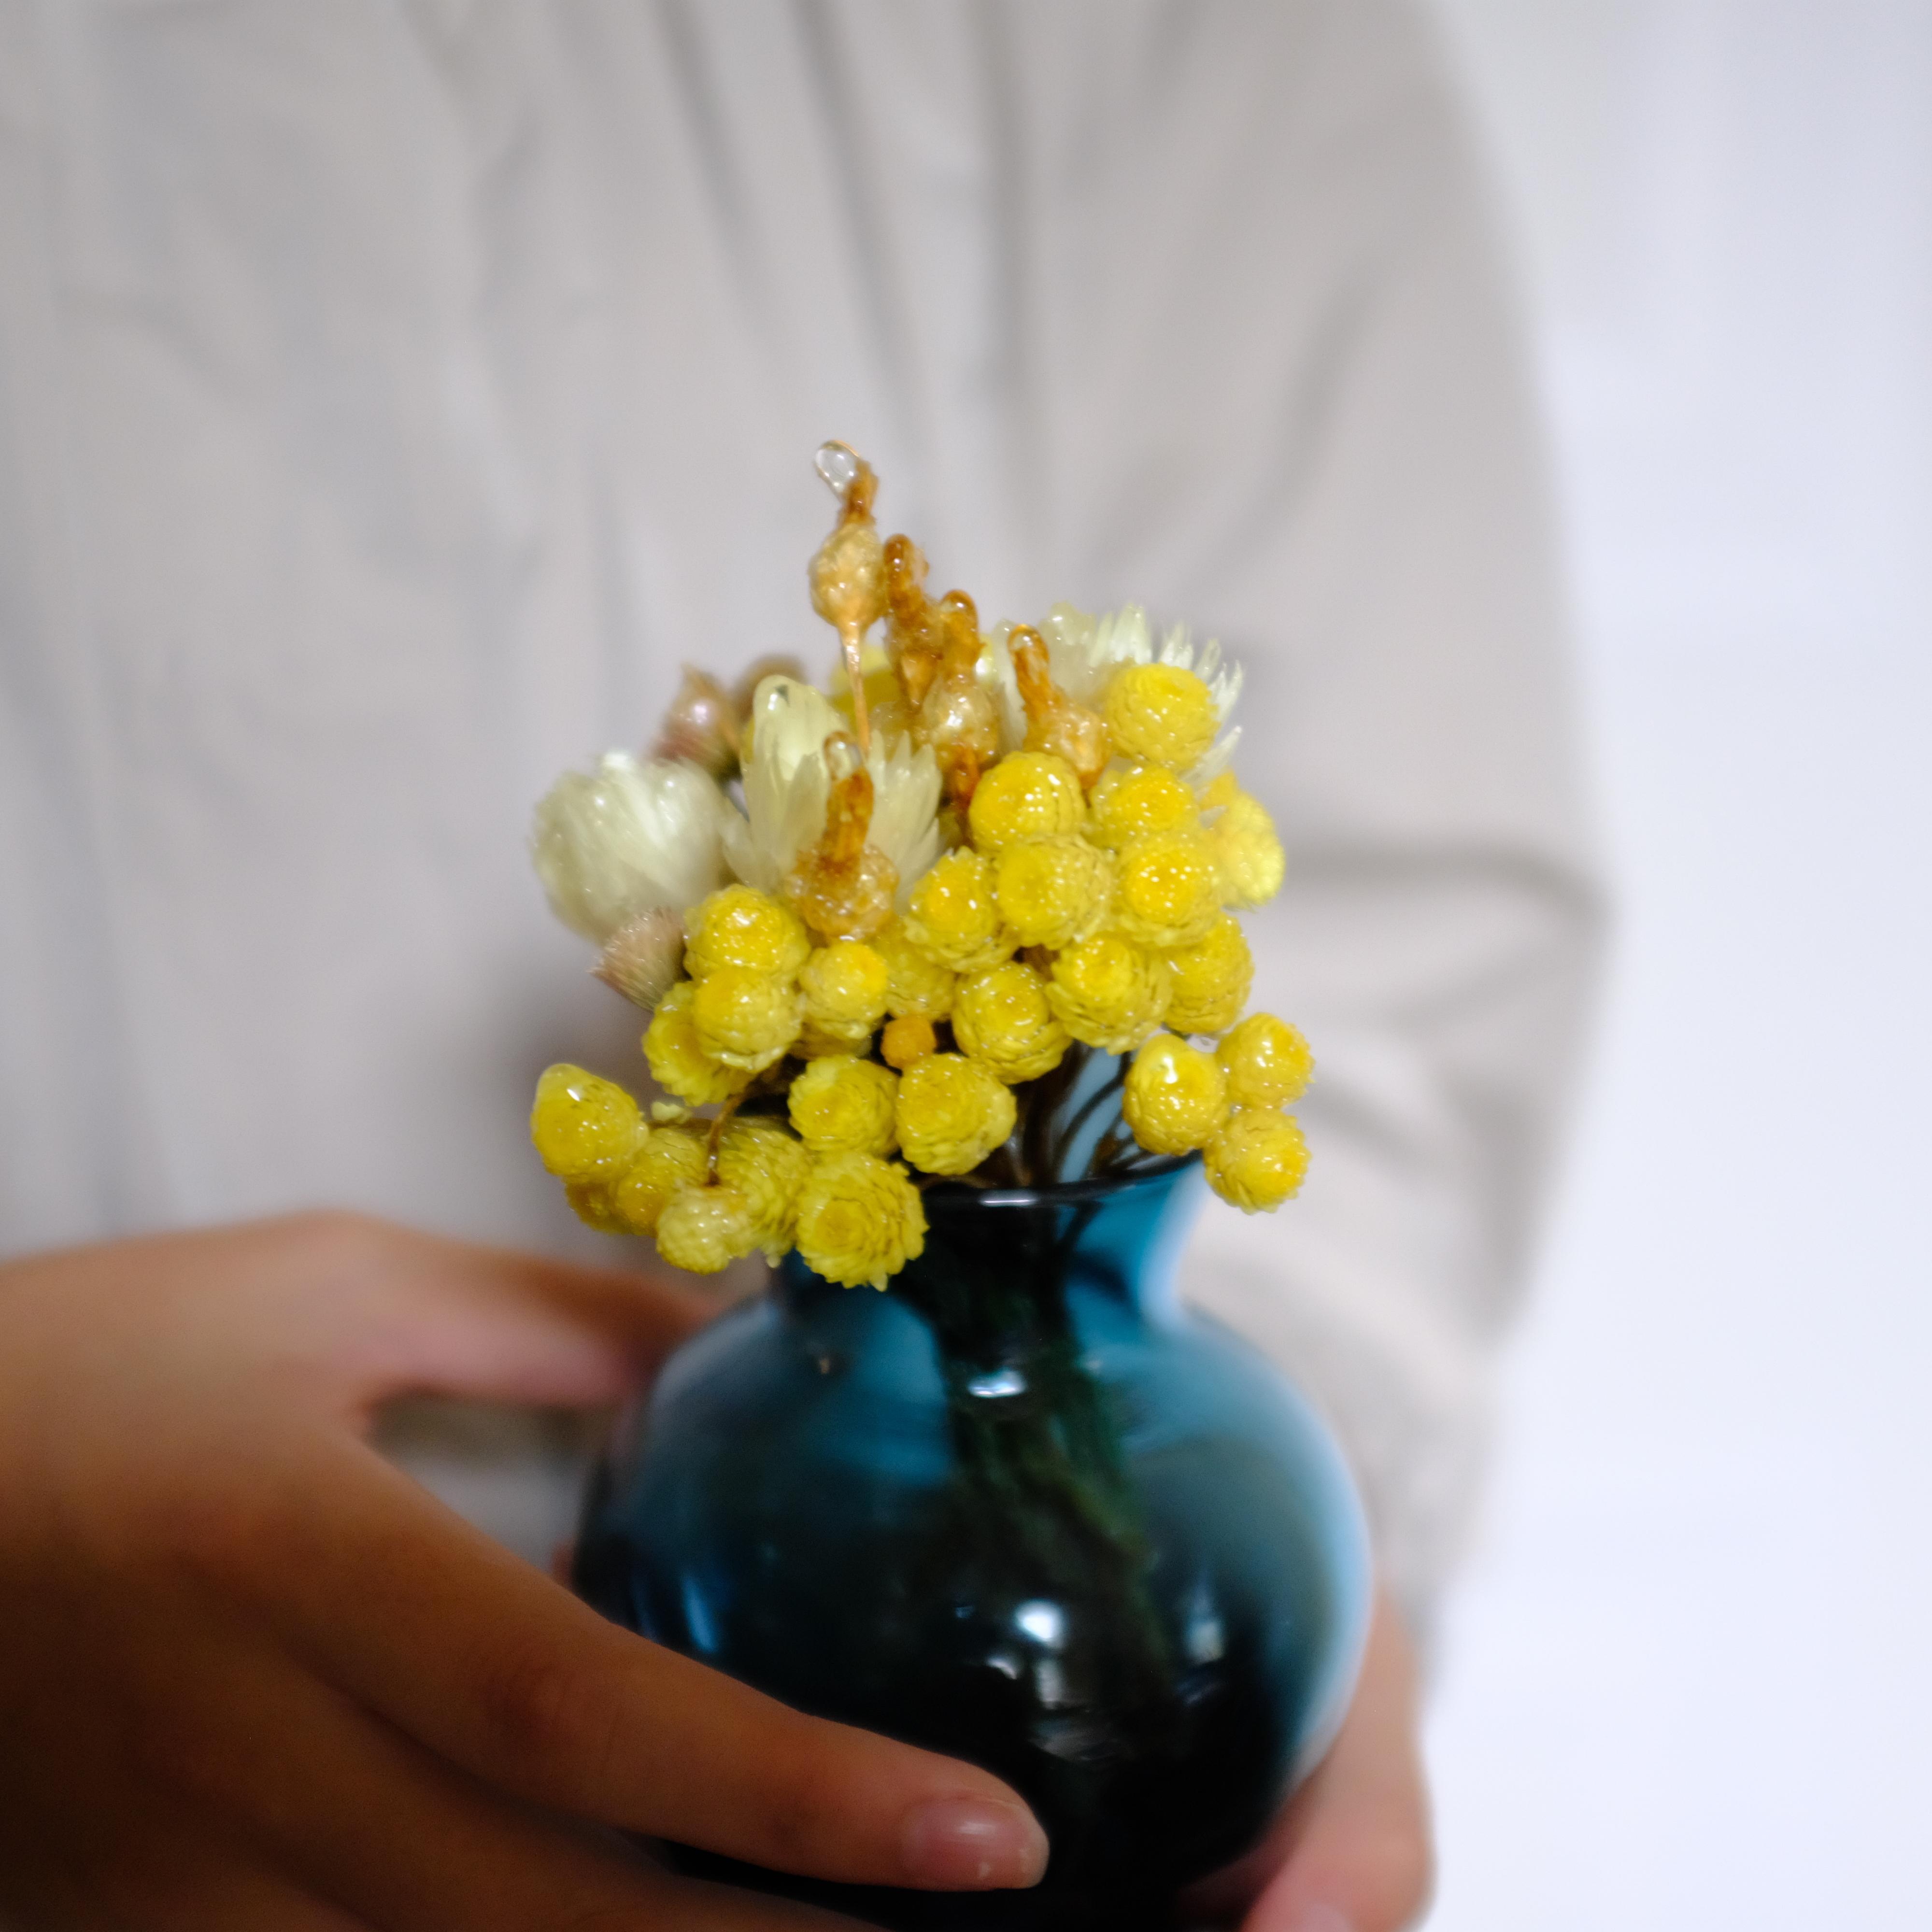 tsuyabana dried flower 花束 4